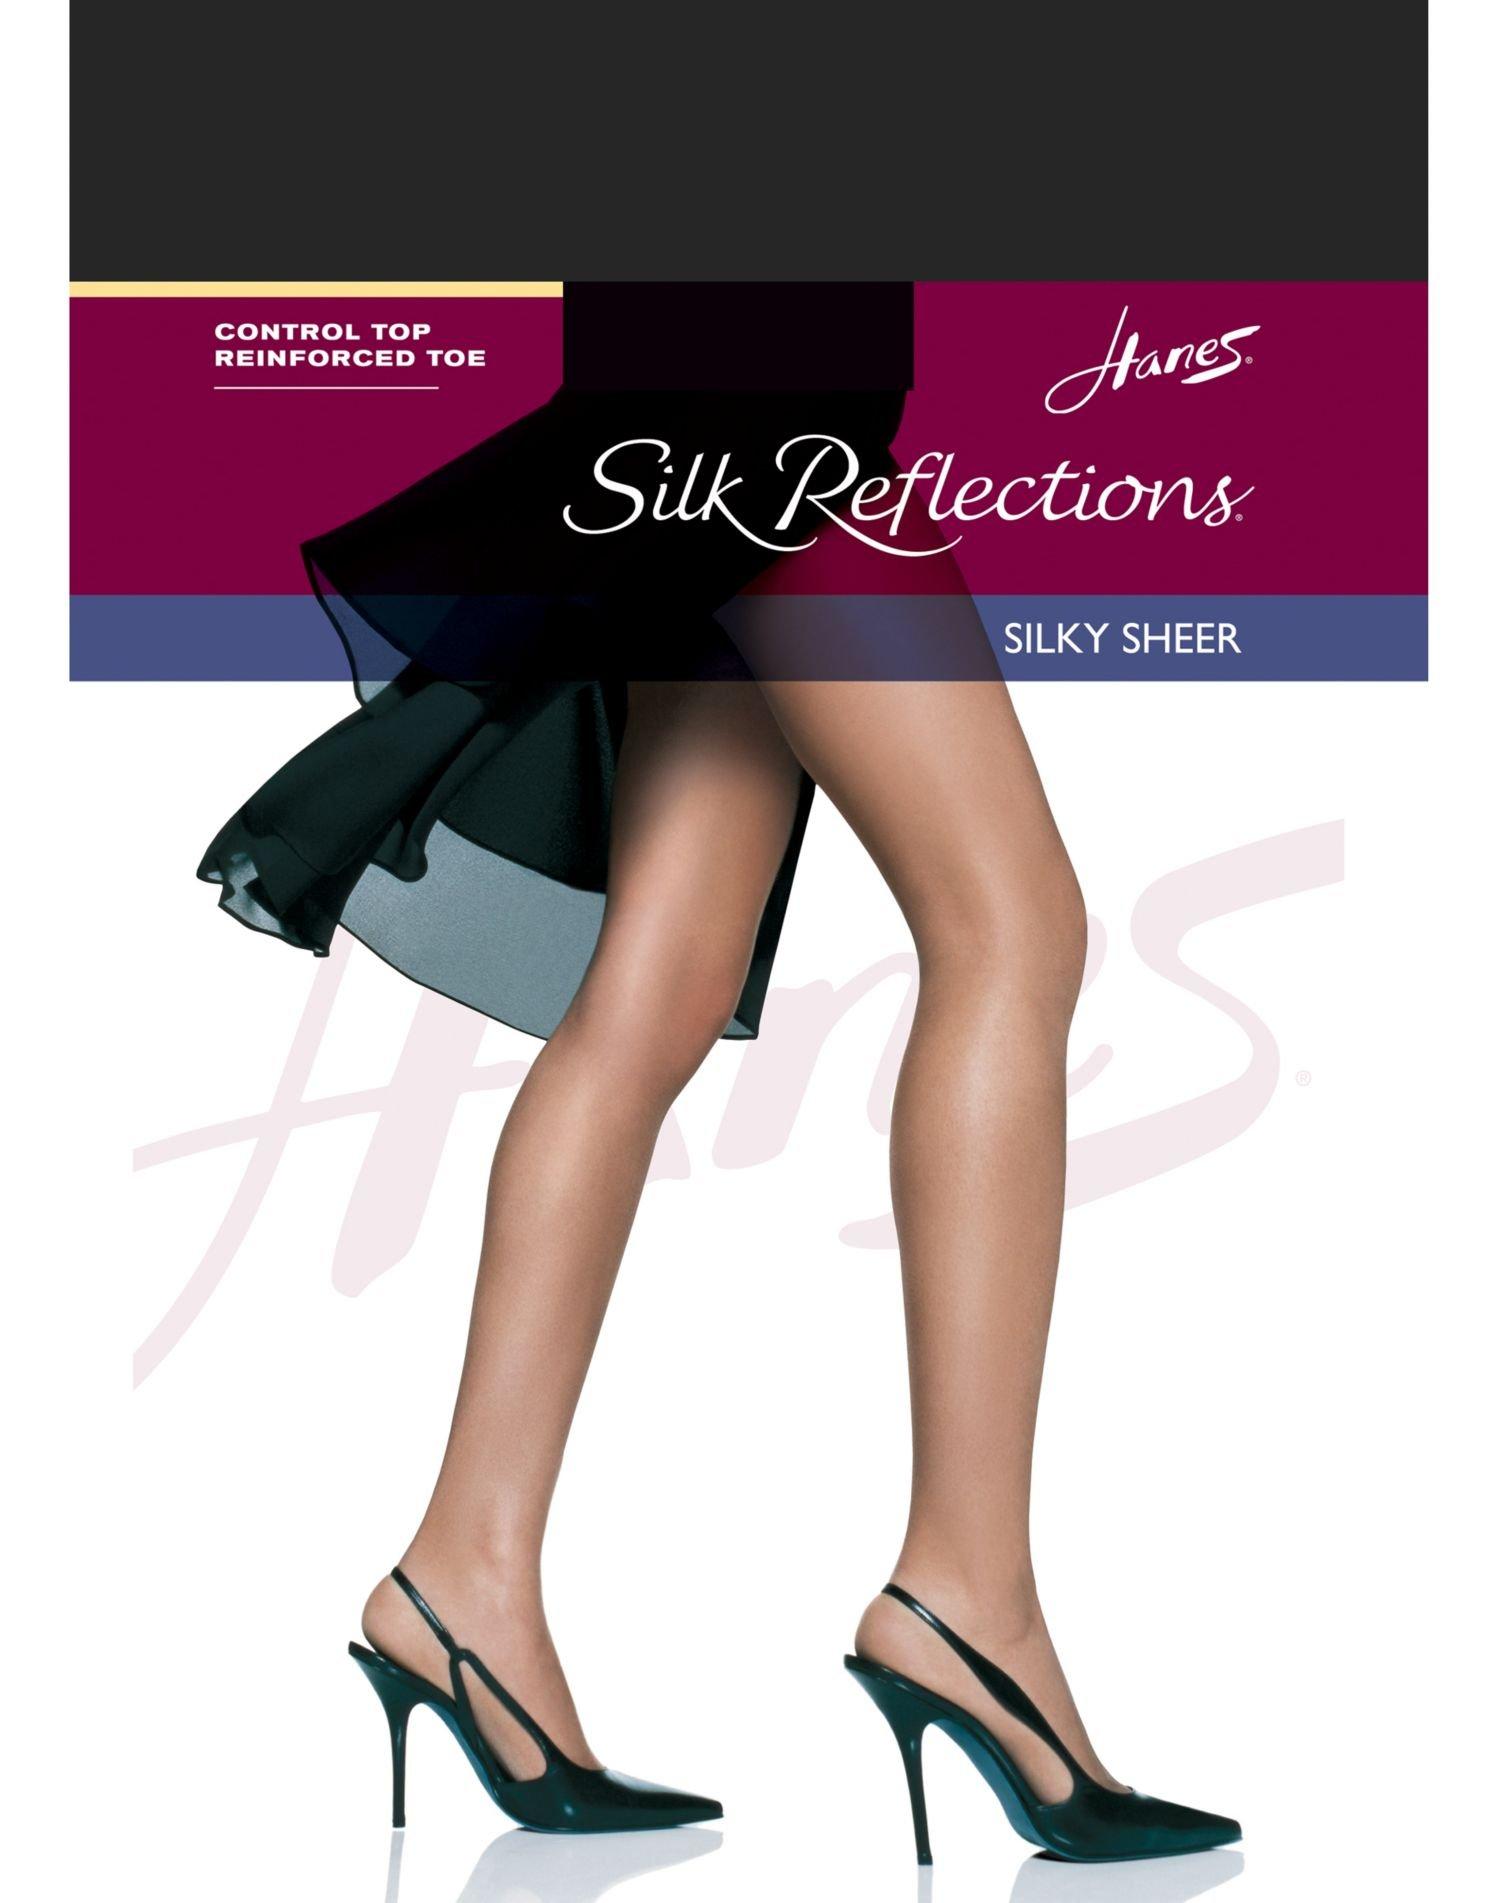 Hanes Silk Reflections Women's Silky Sheer Hosiery, Jet, CD (Pack of 3)